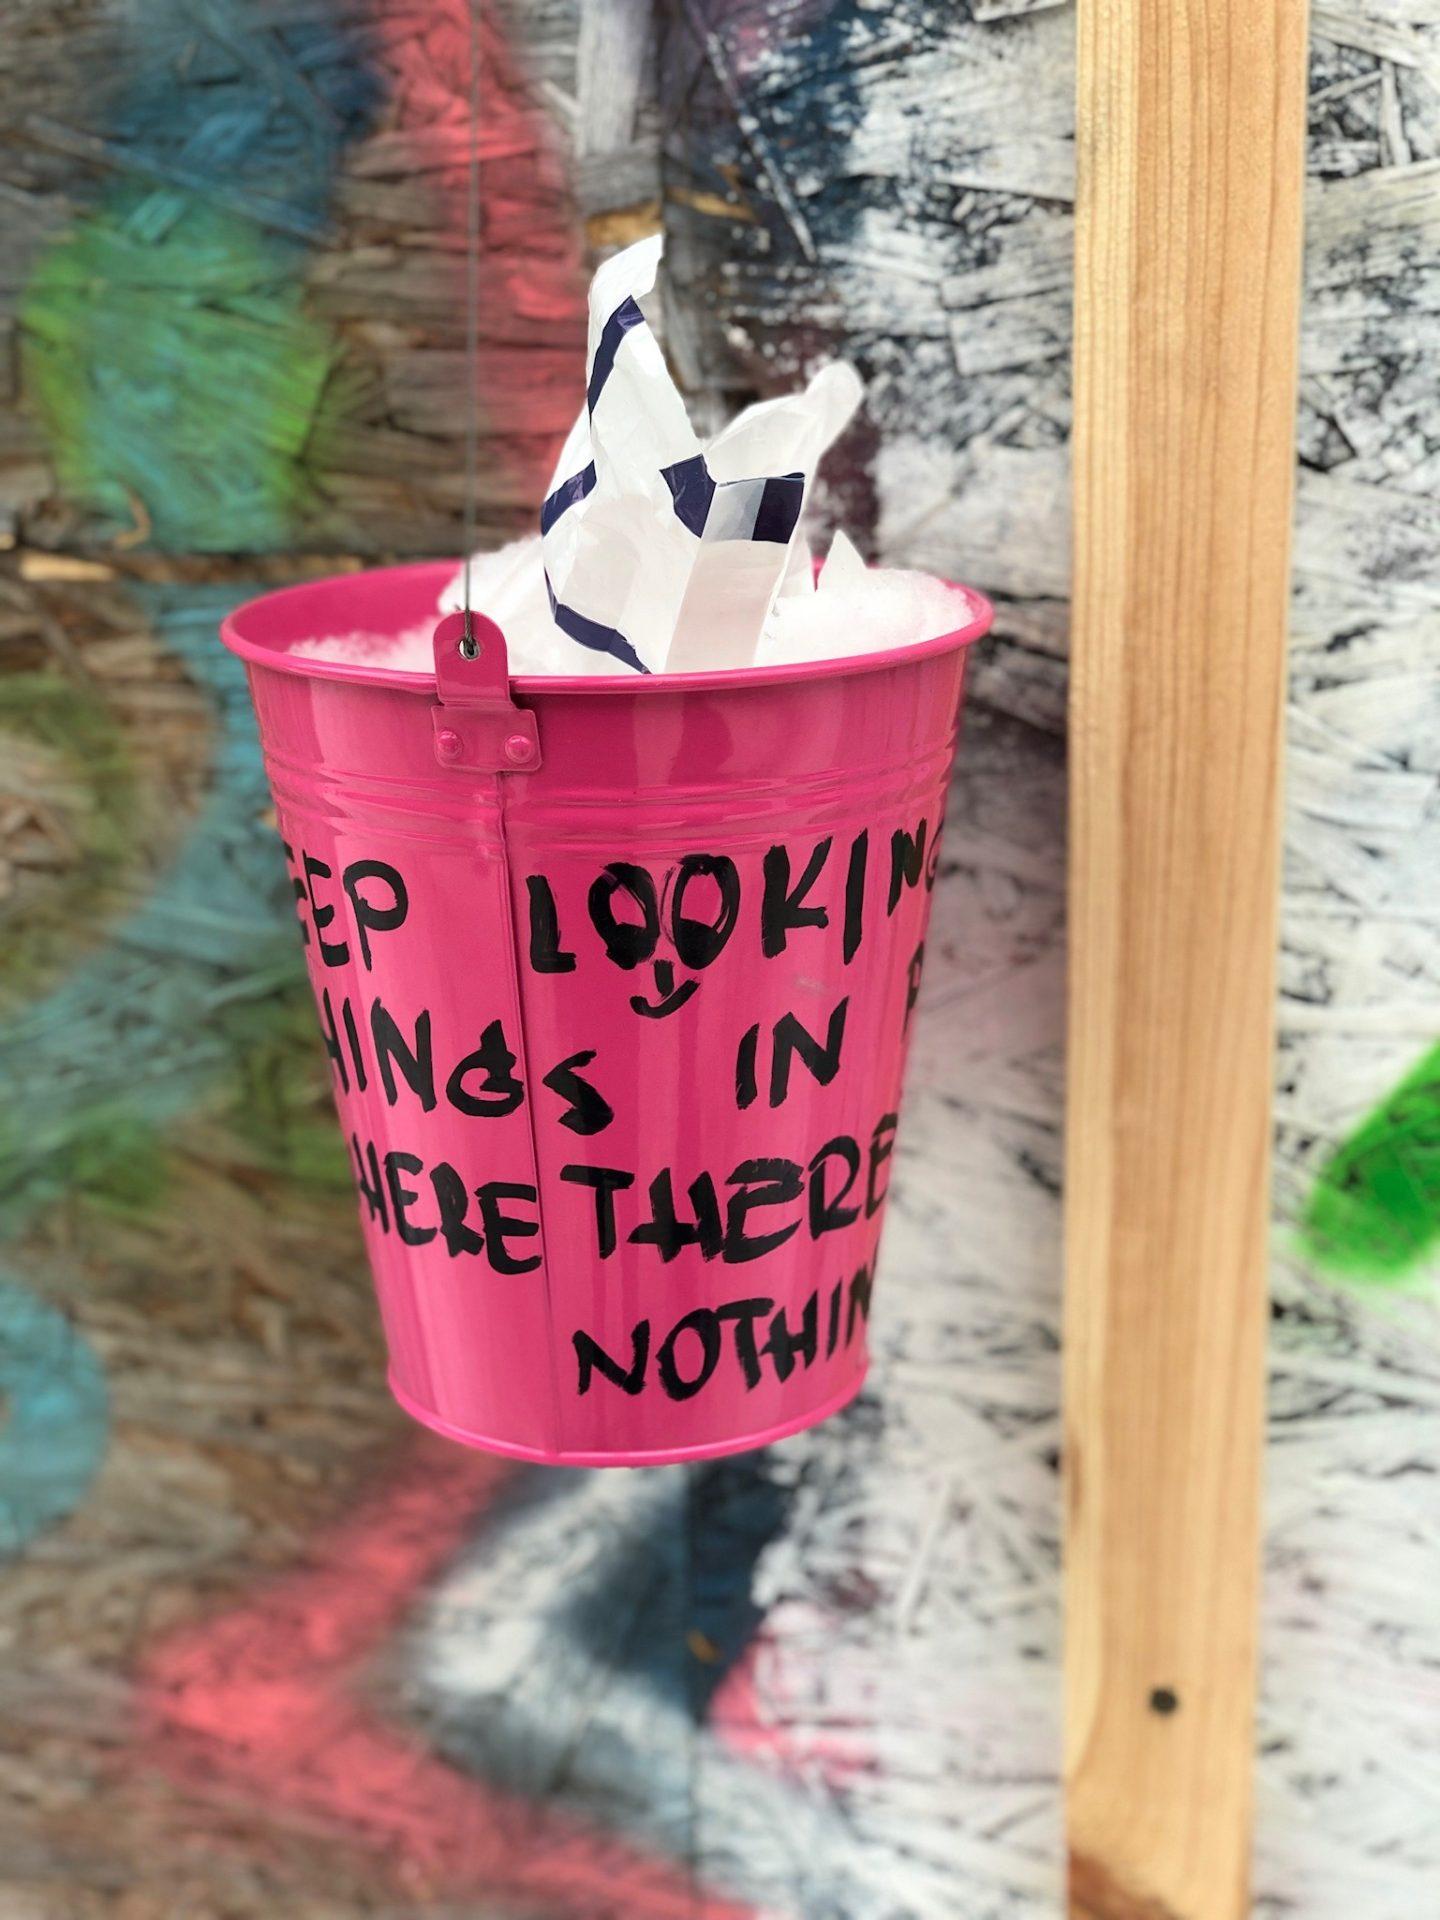 A pink bucket, part of an art installation in Uzepius, Vilnius